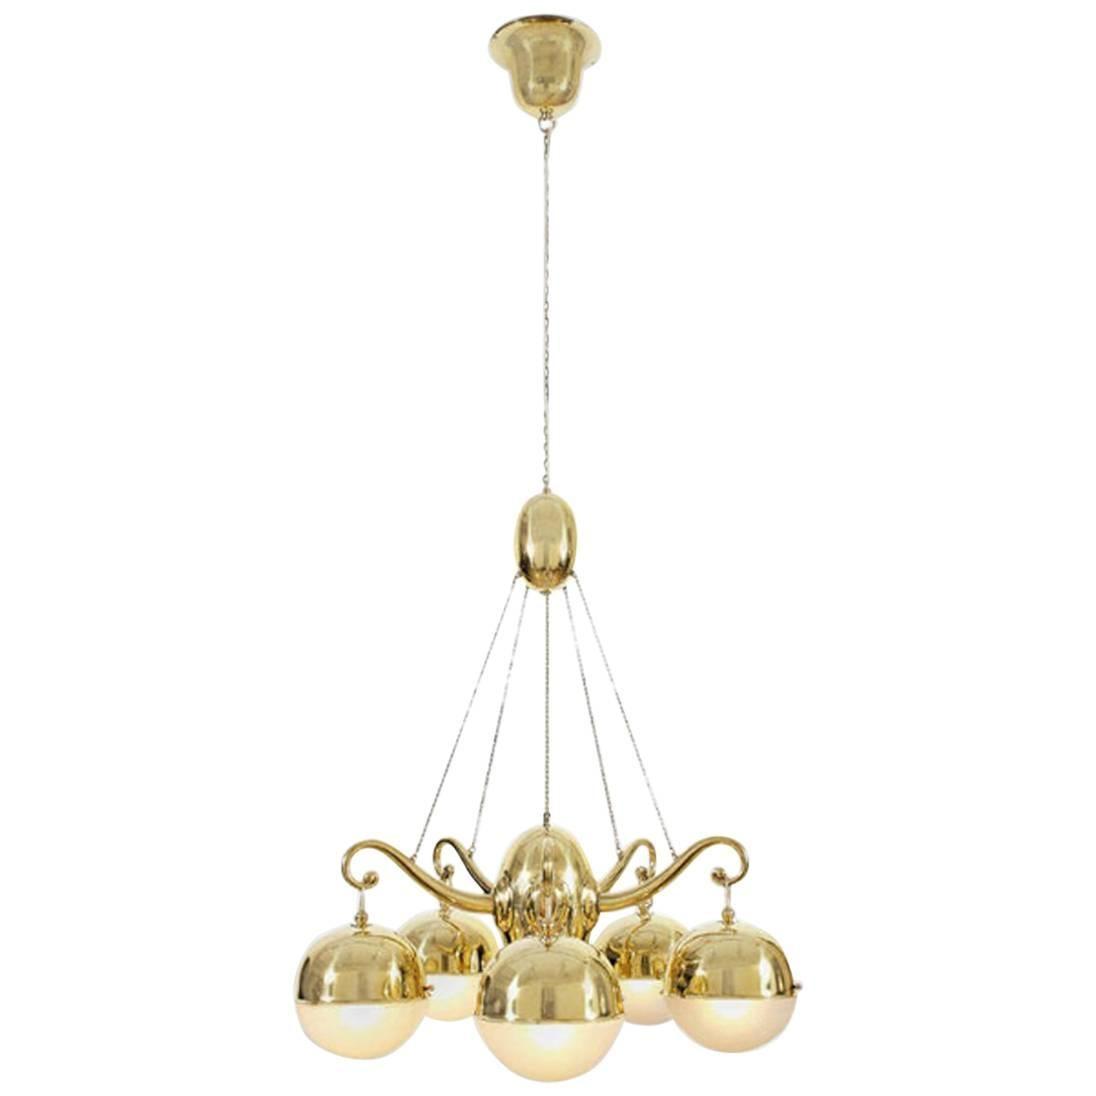 Josef Hoffmann & Wiener Werkstaette Ceiling Lamp, Re-Edition